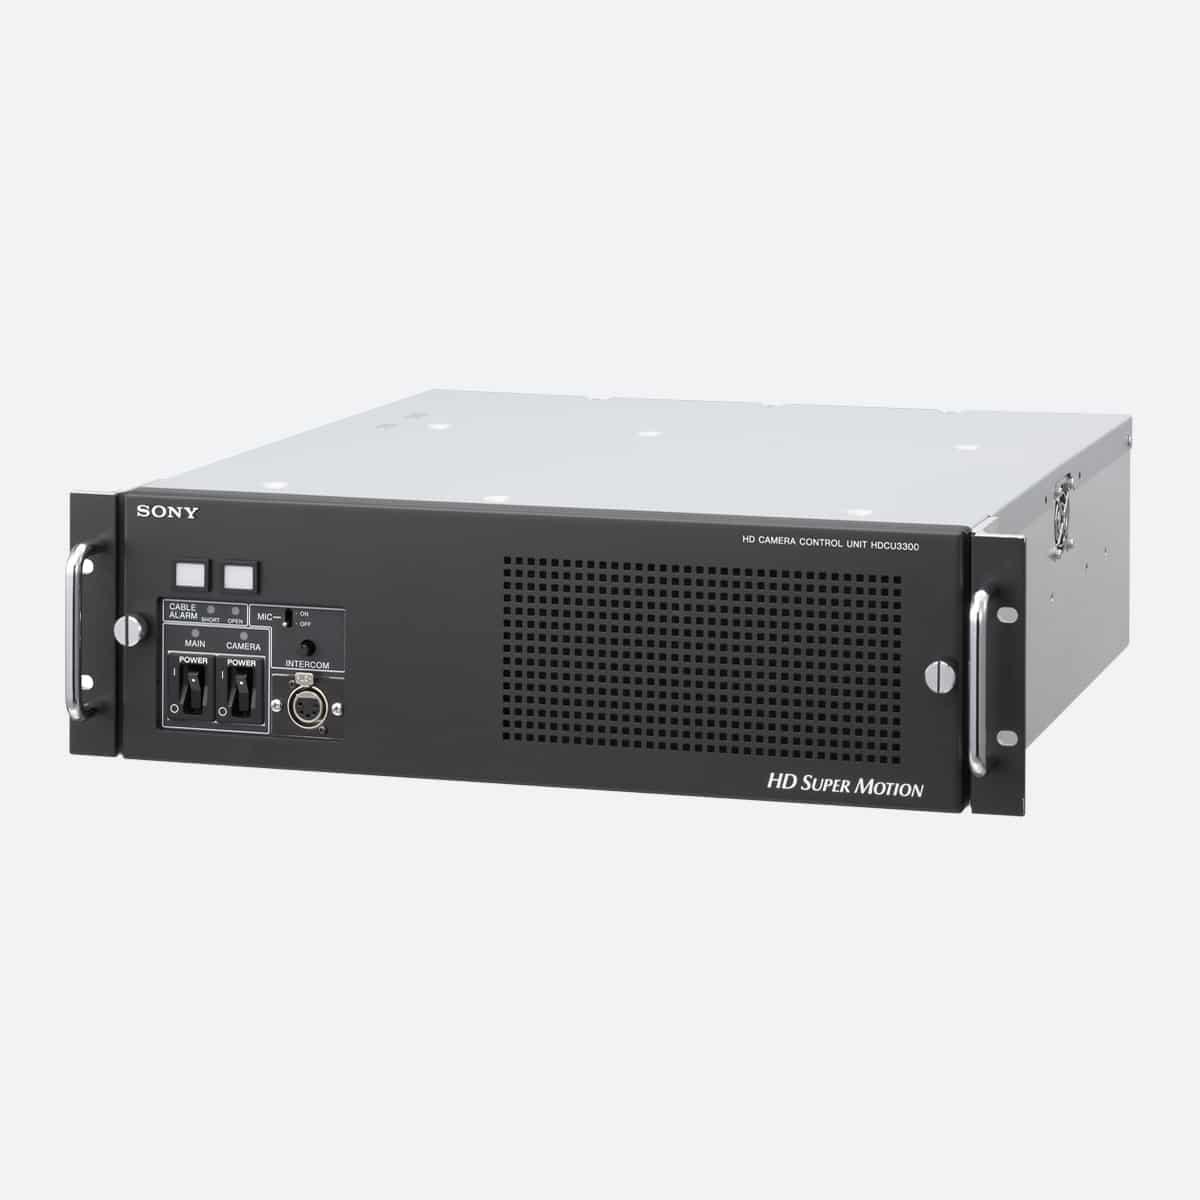 Sony HDCU-3300 HD Super Motion Camera Control Unit